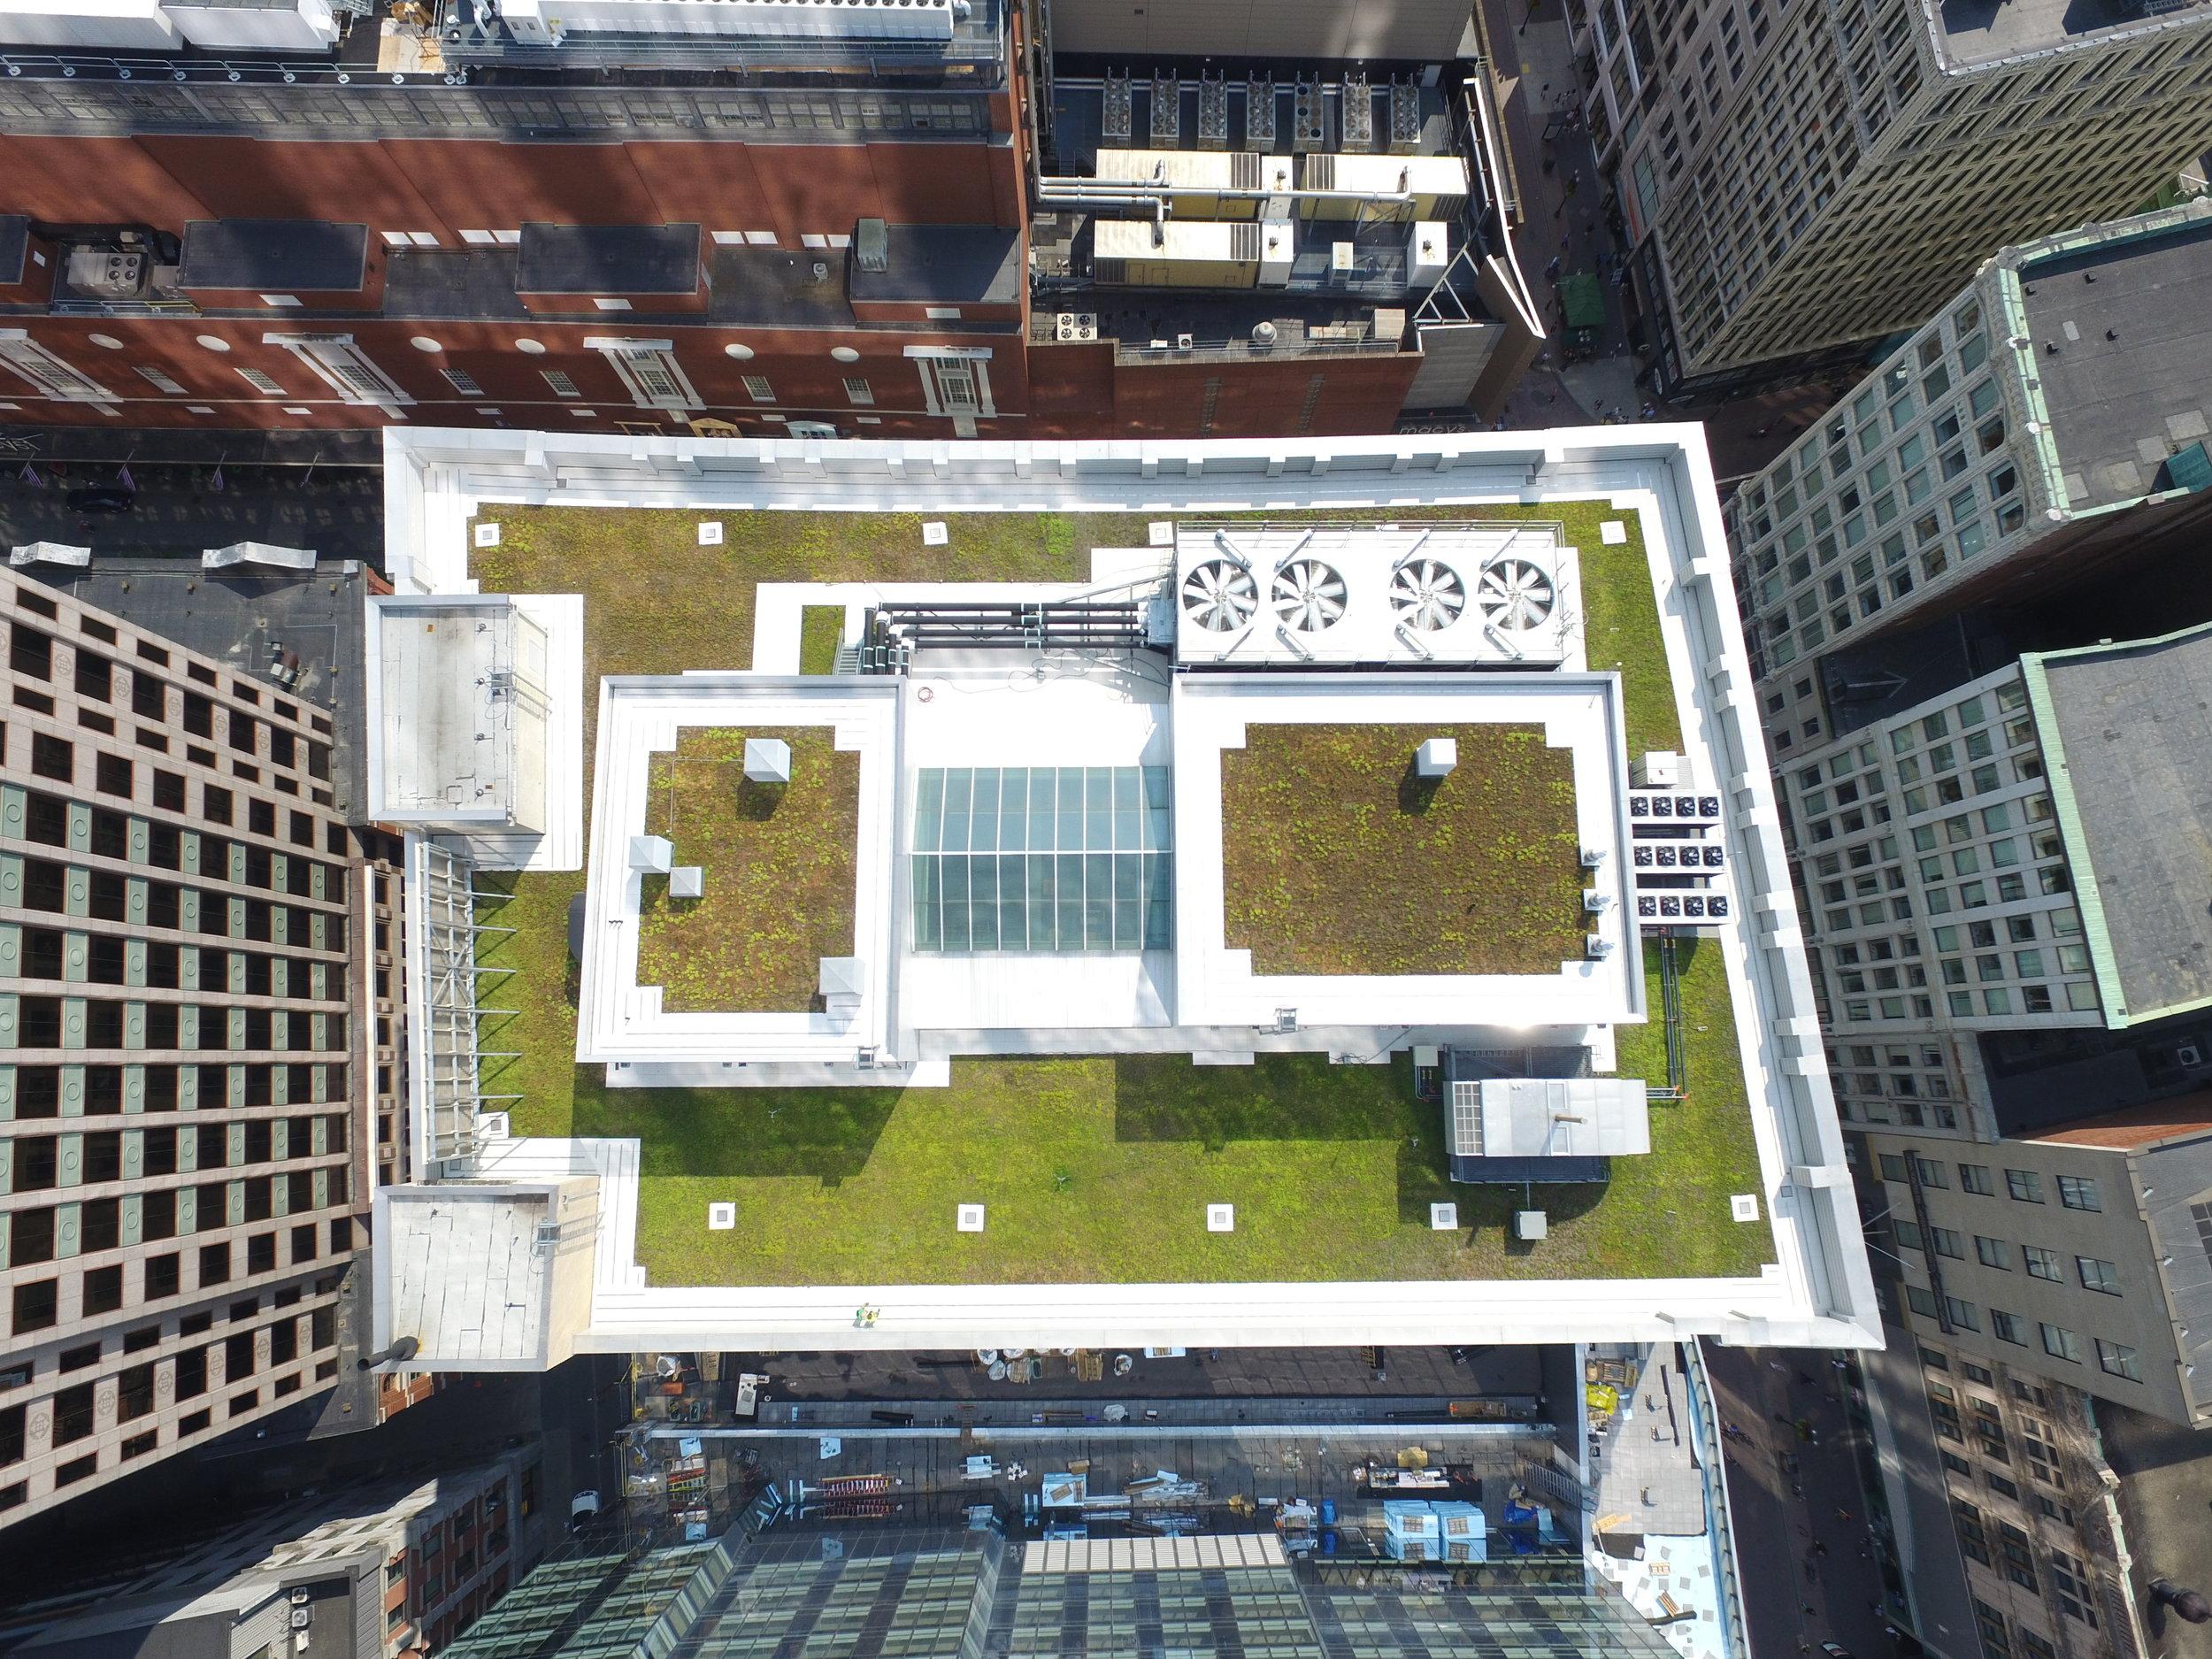 recover-green-roofs-burnham-2016-5.JPG